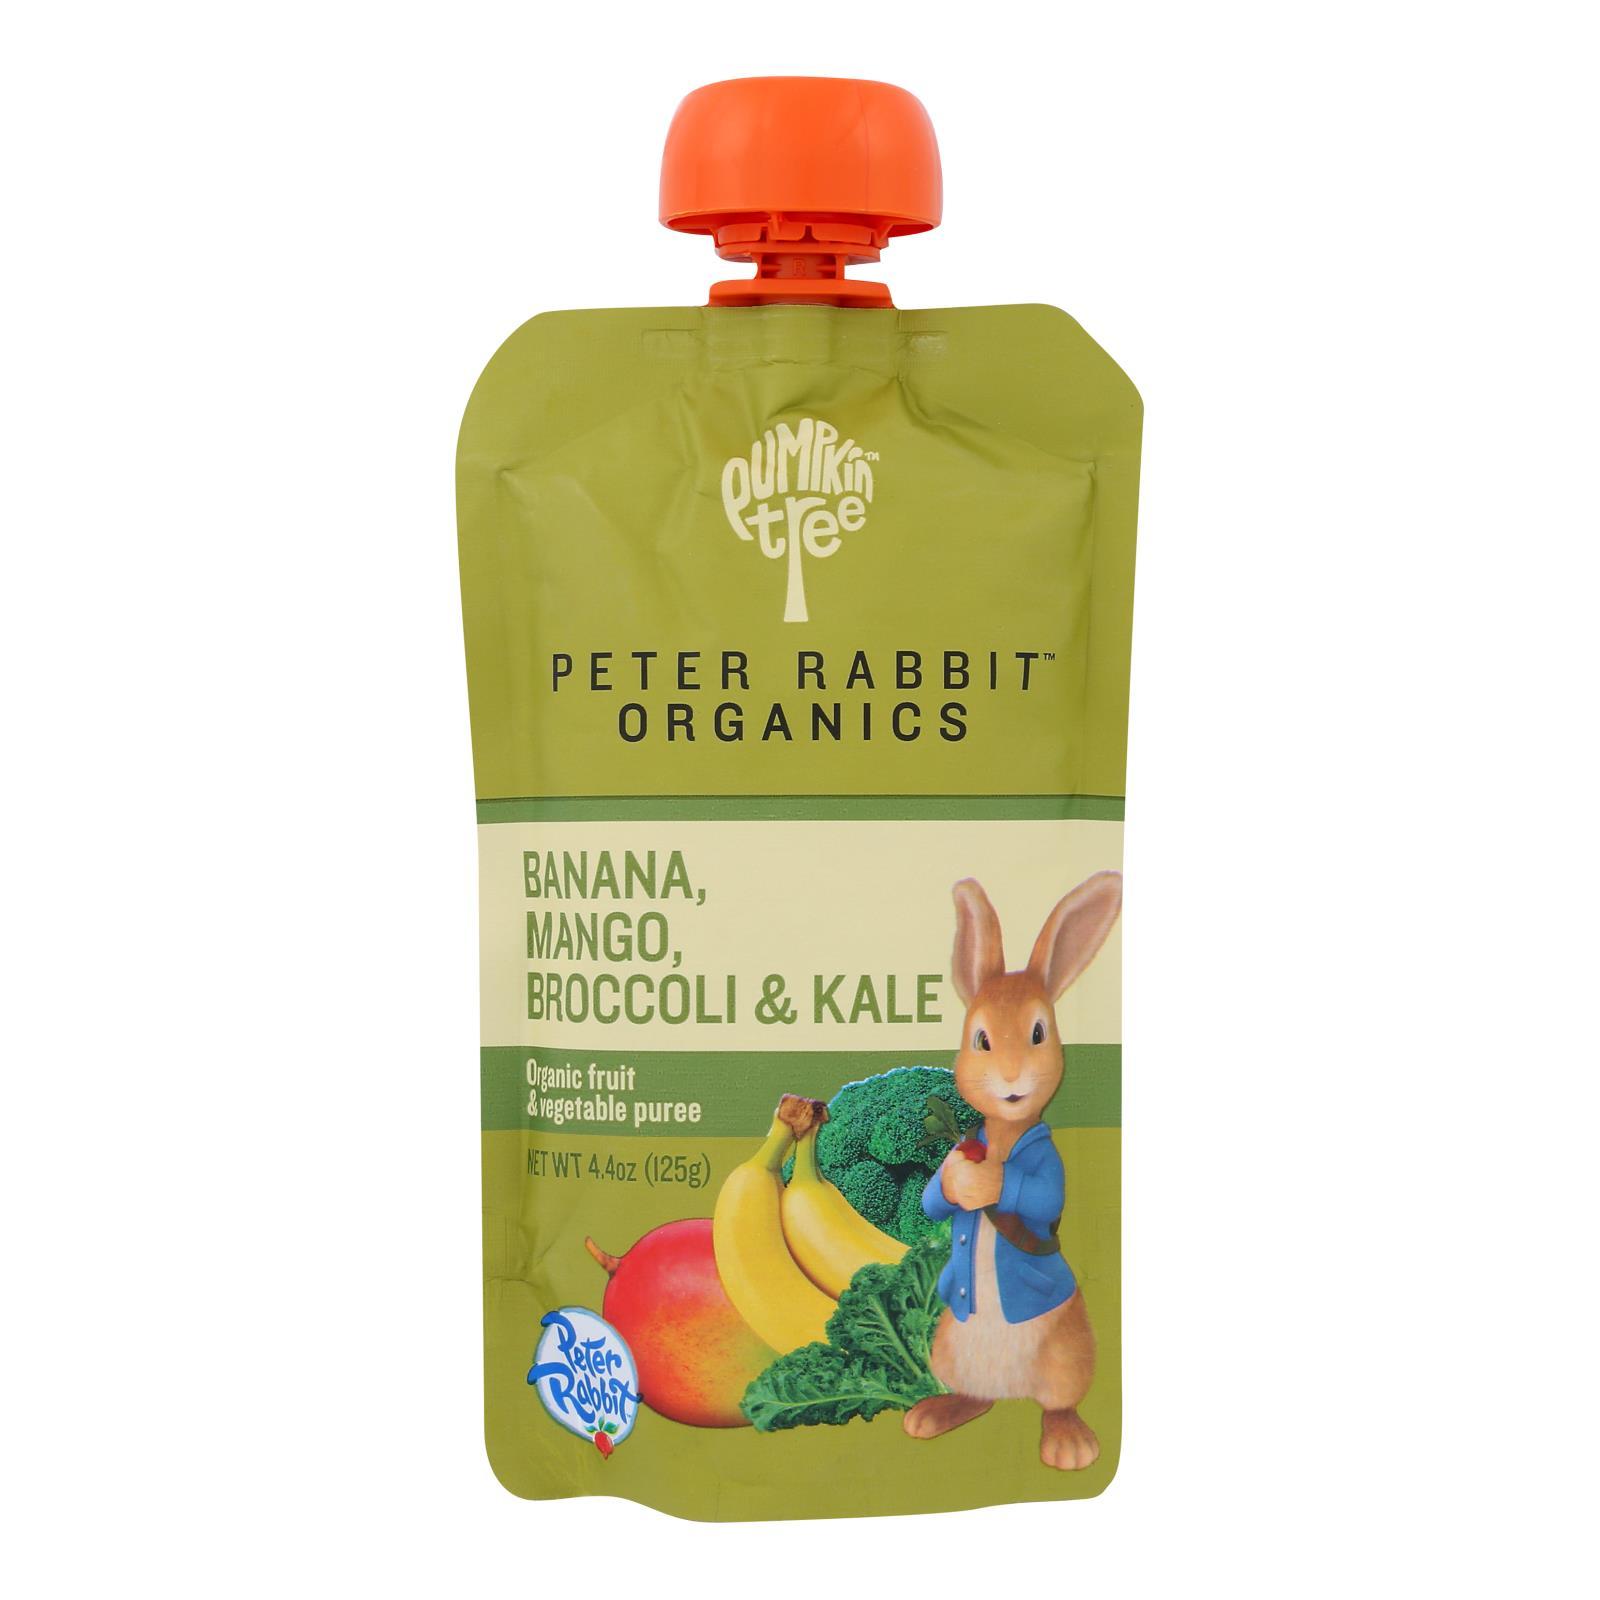 Peter Rabbit Organics Veggie Snacks - Kale Broccoli and Mango with Banana - Case of 10 - 4.4 oz.